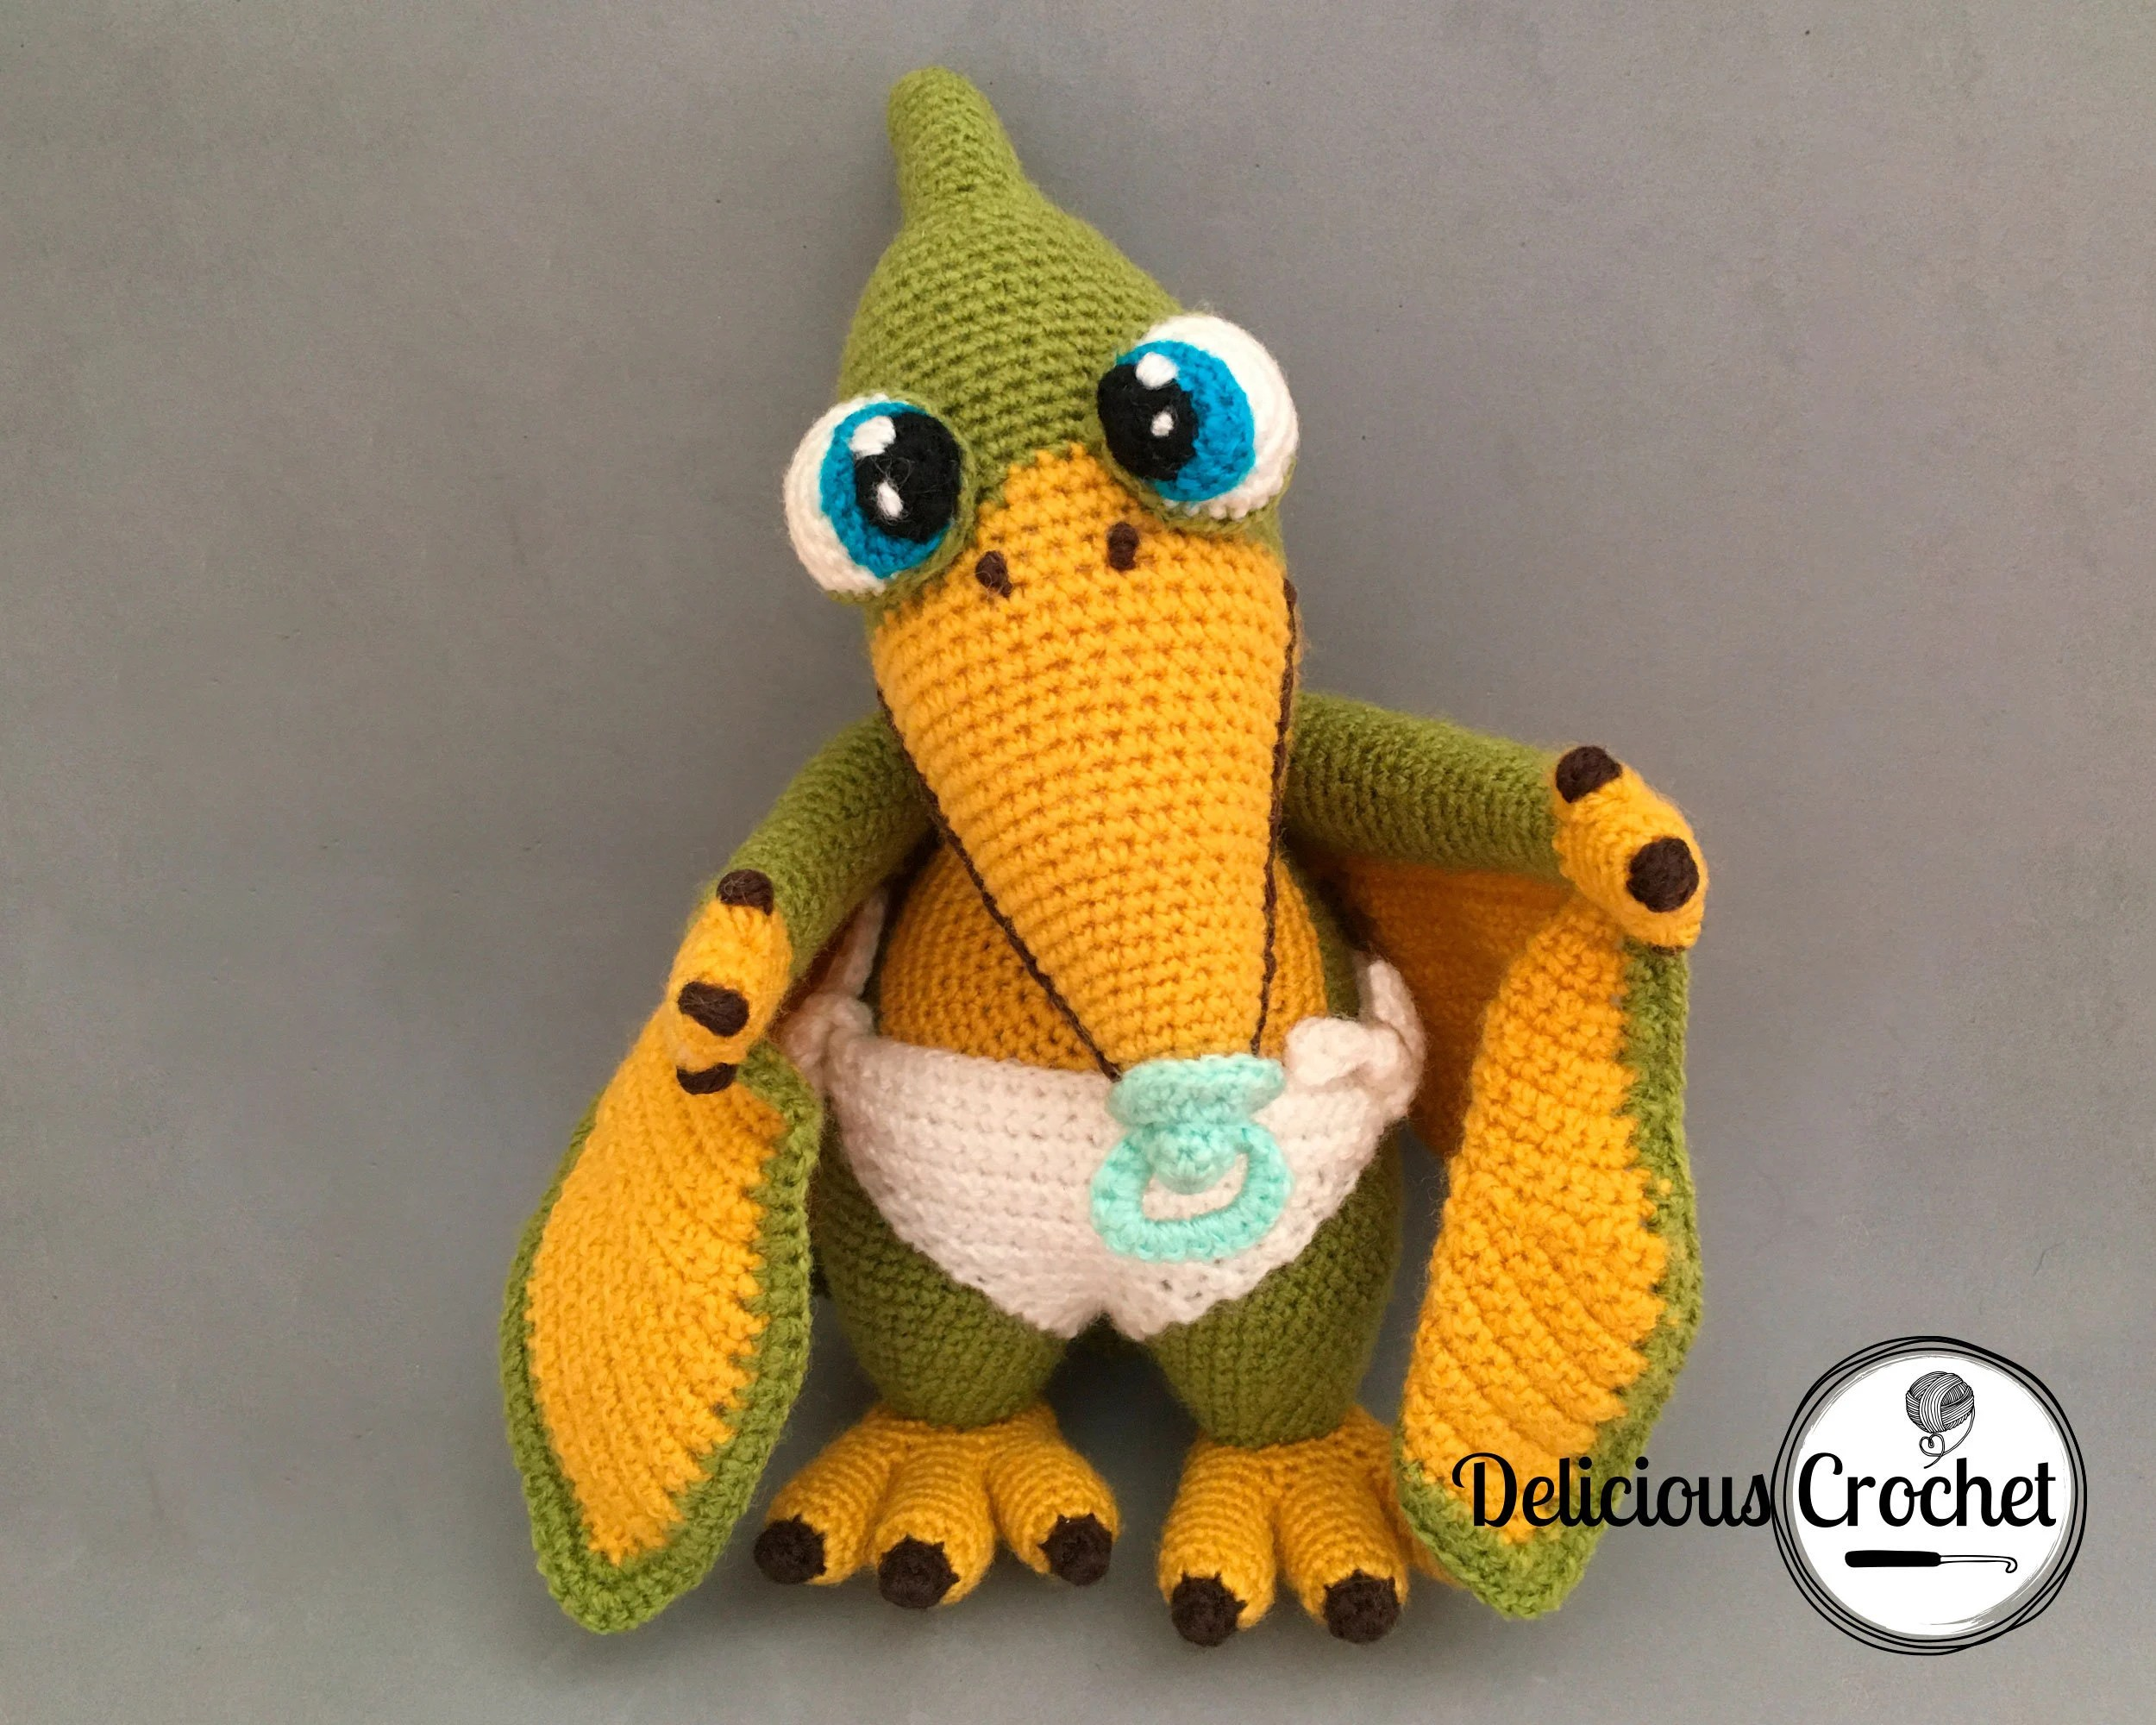 Cutie garden is a game that is hard to stop playing. Amigurumi Pattern Crochet Baby Pterosaur Dinosaur DIY